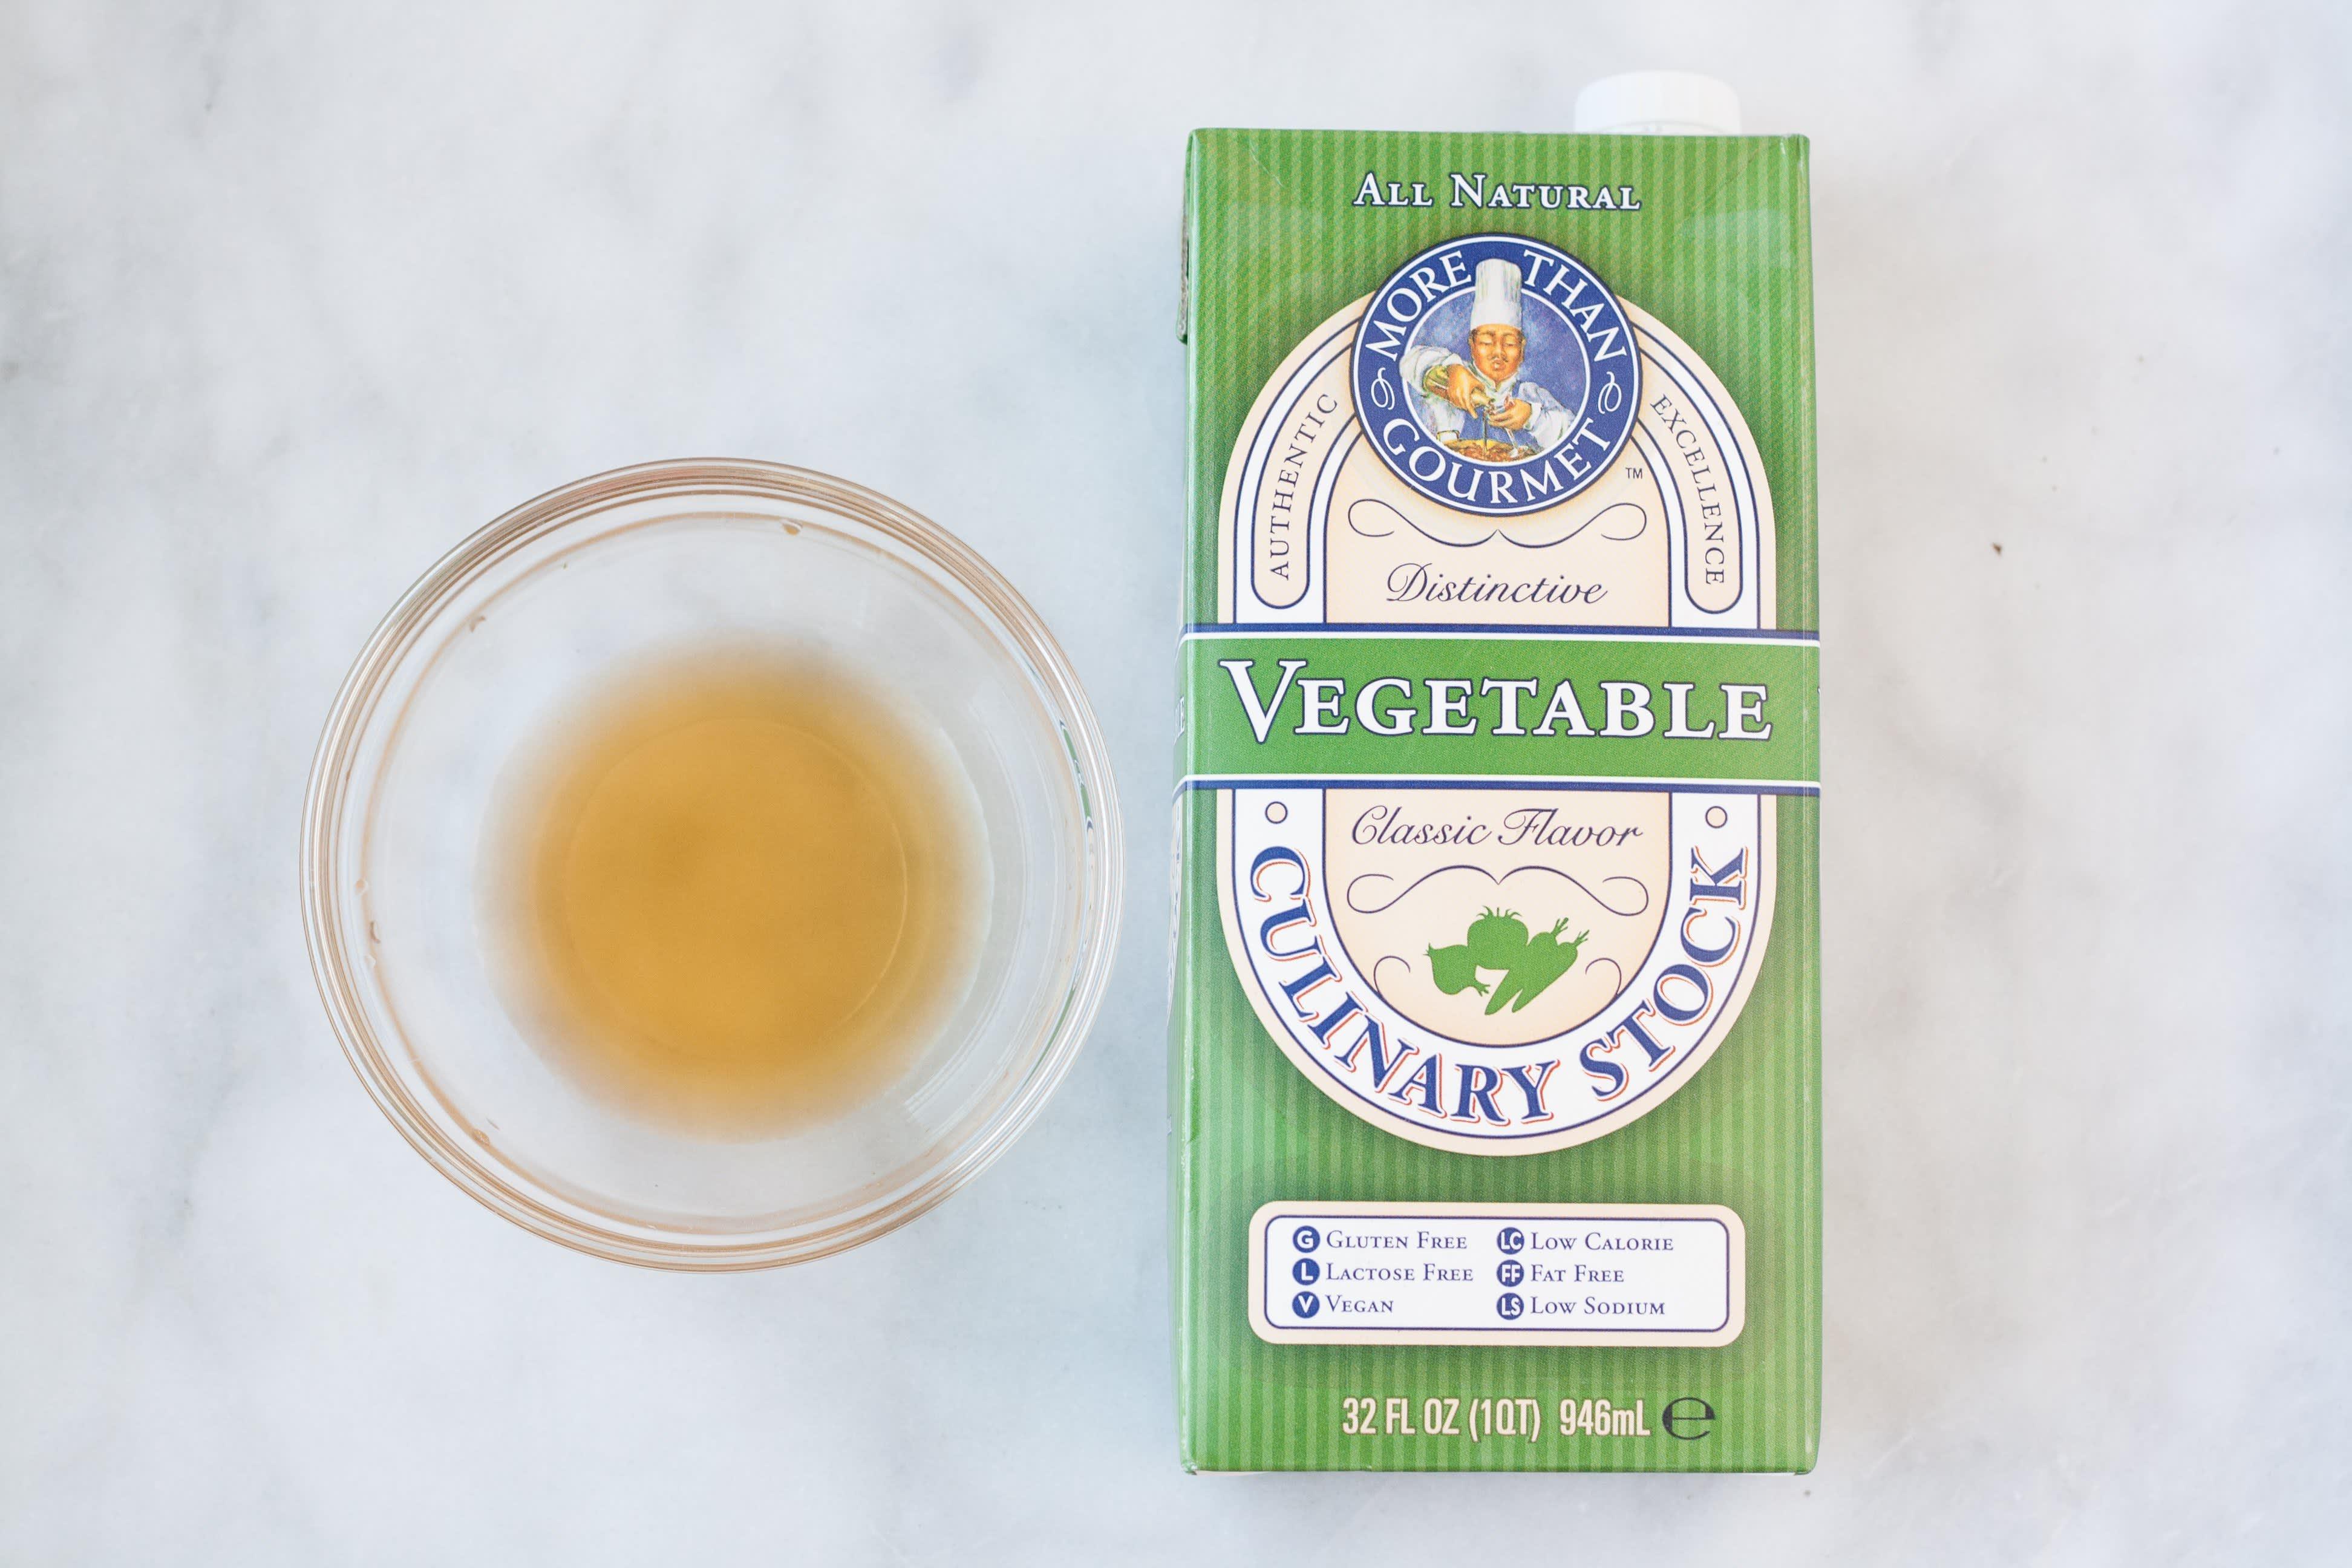 More than Gourmet Vegetable Broth